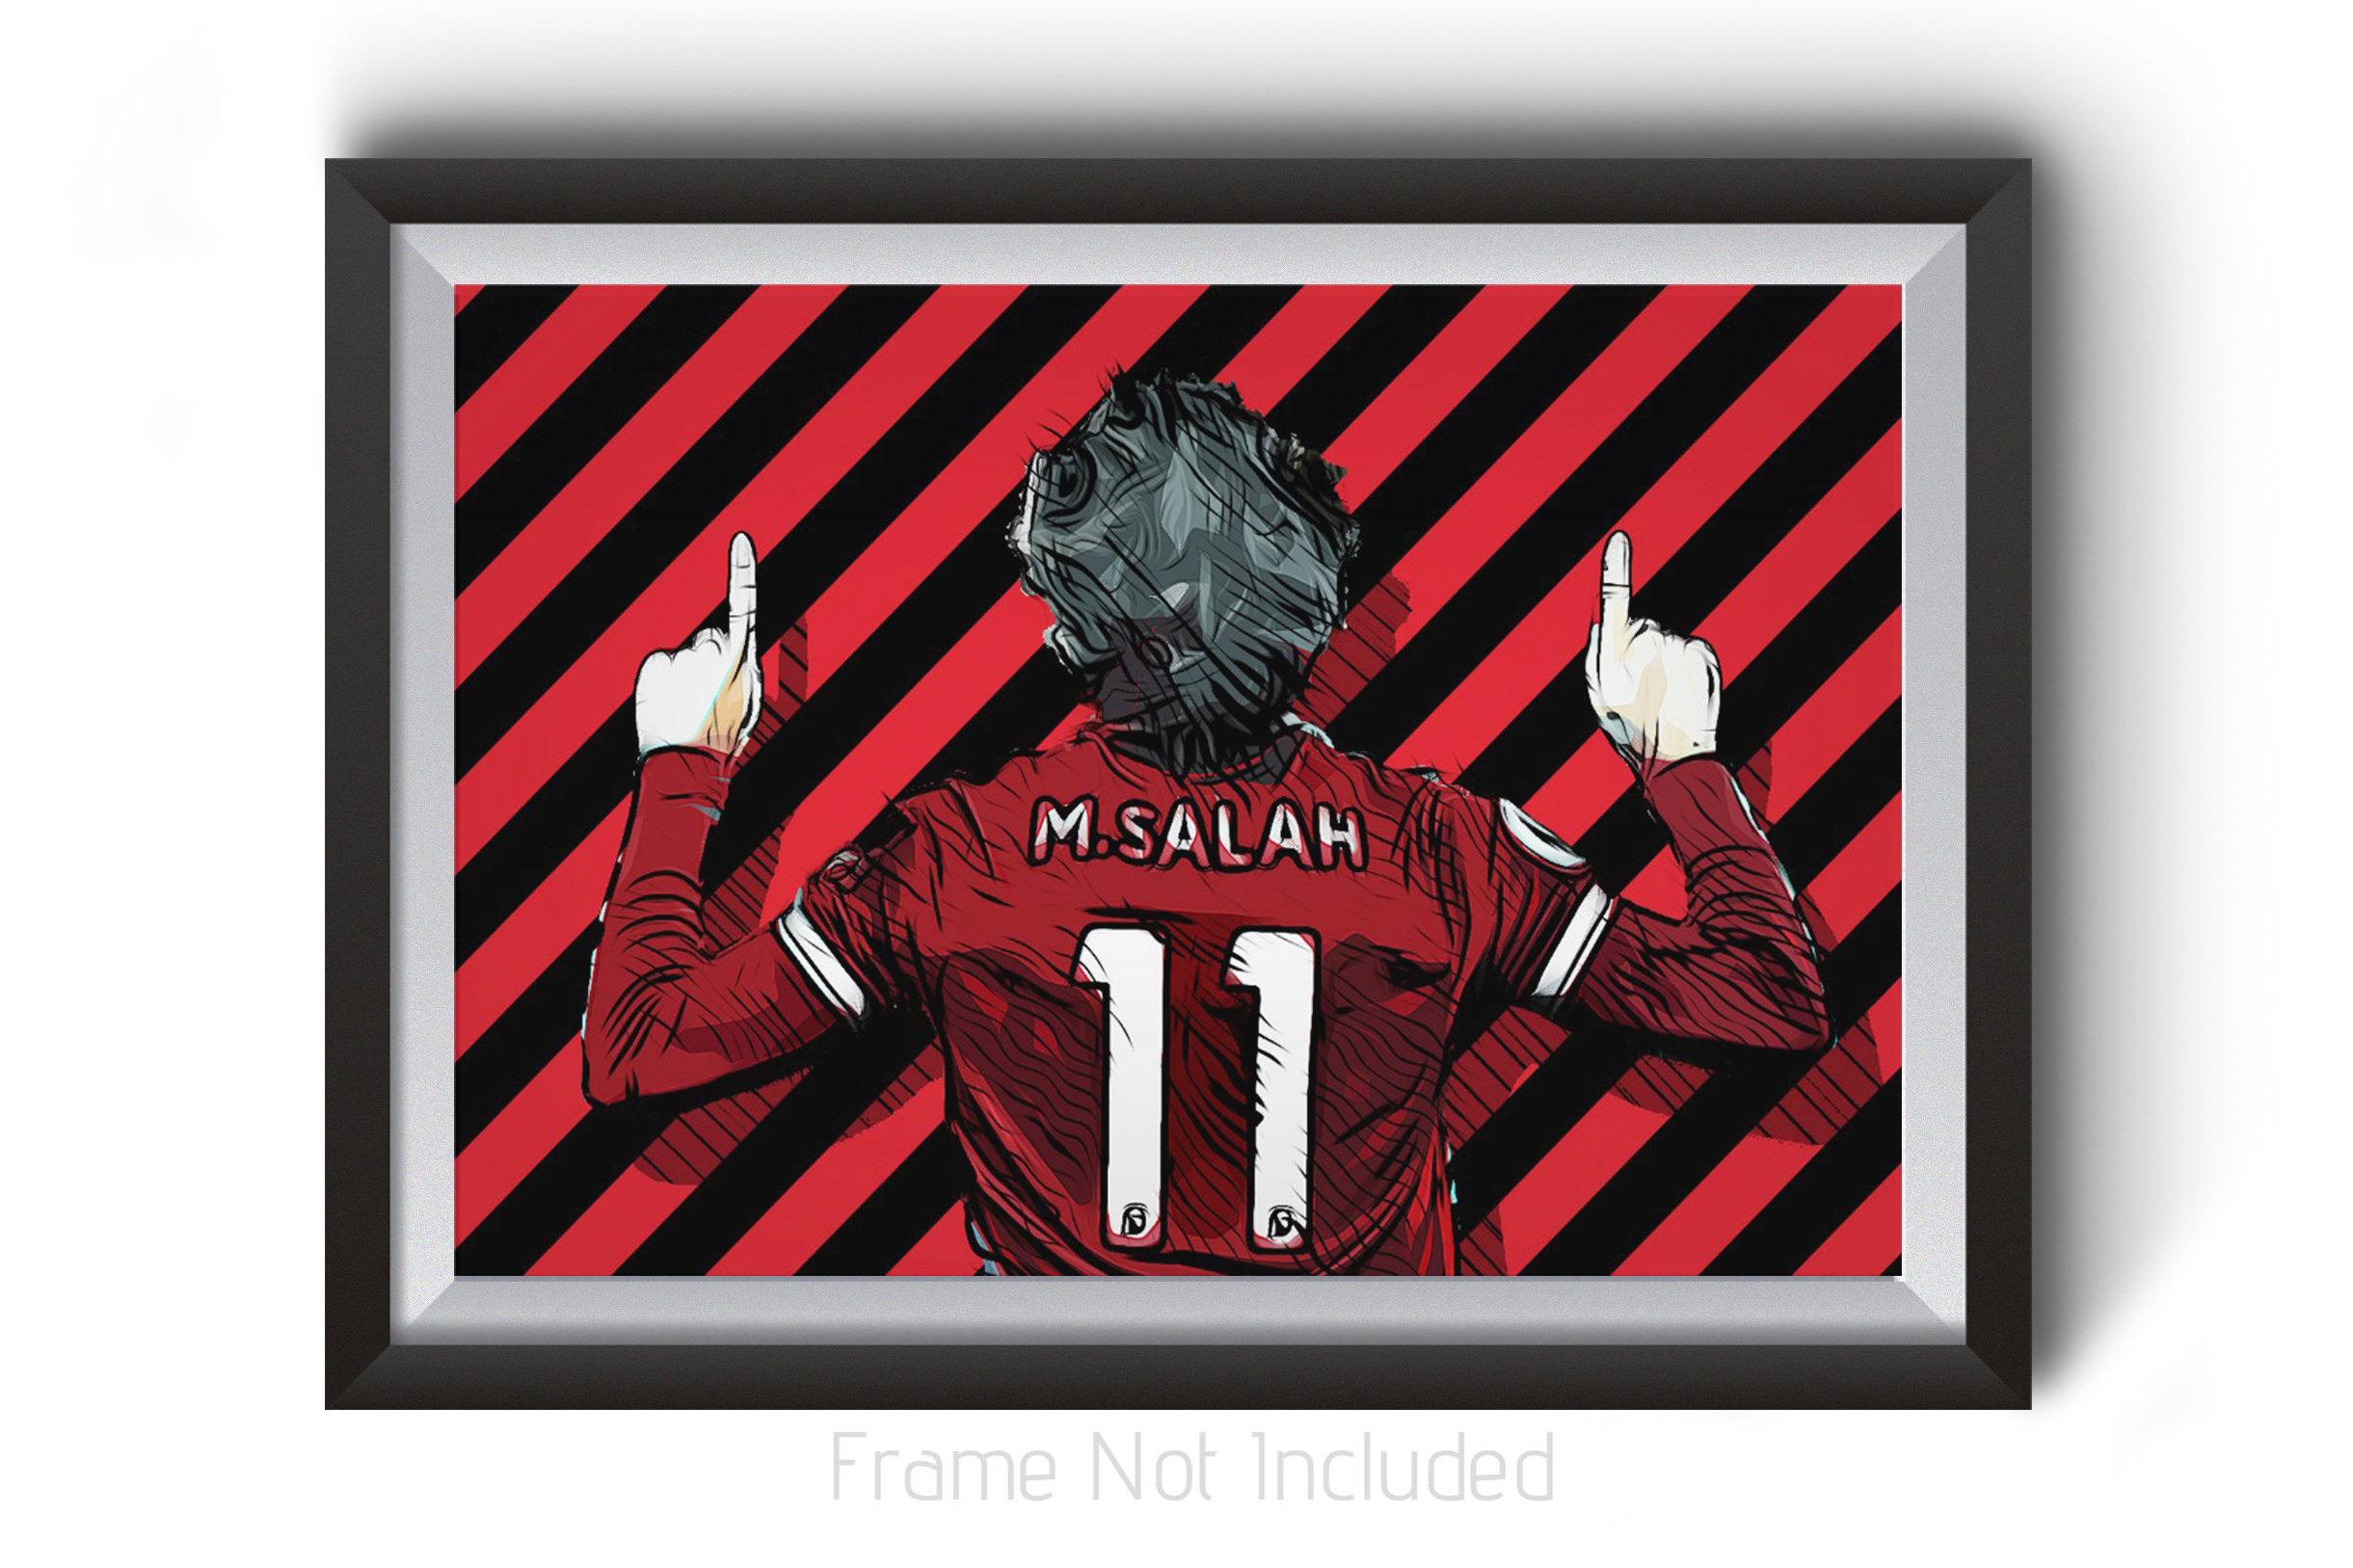 b6d01dac4 Mohamed Mo Salah Poster Liverpool FC Wall Art Prints LFC